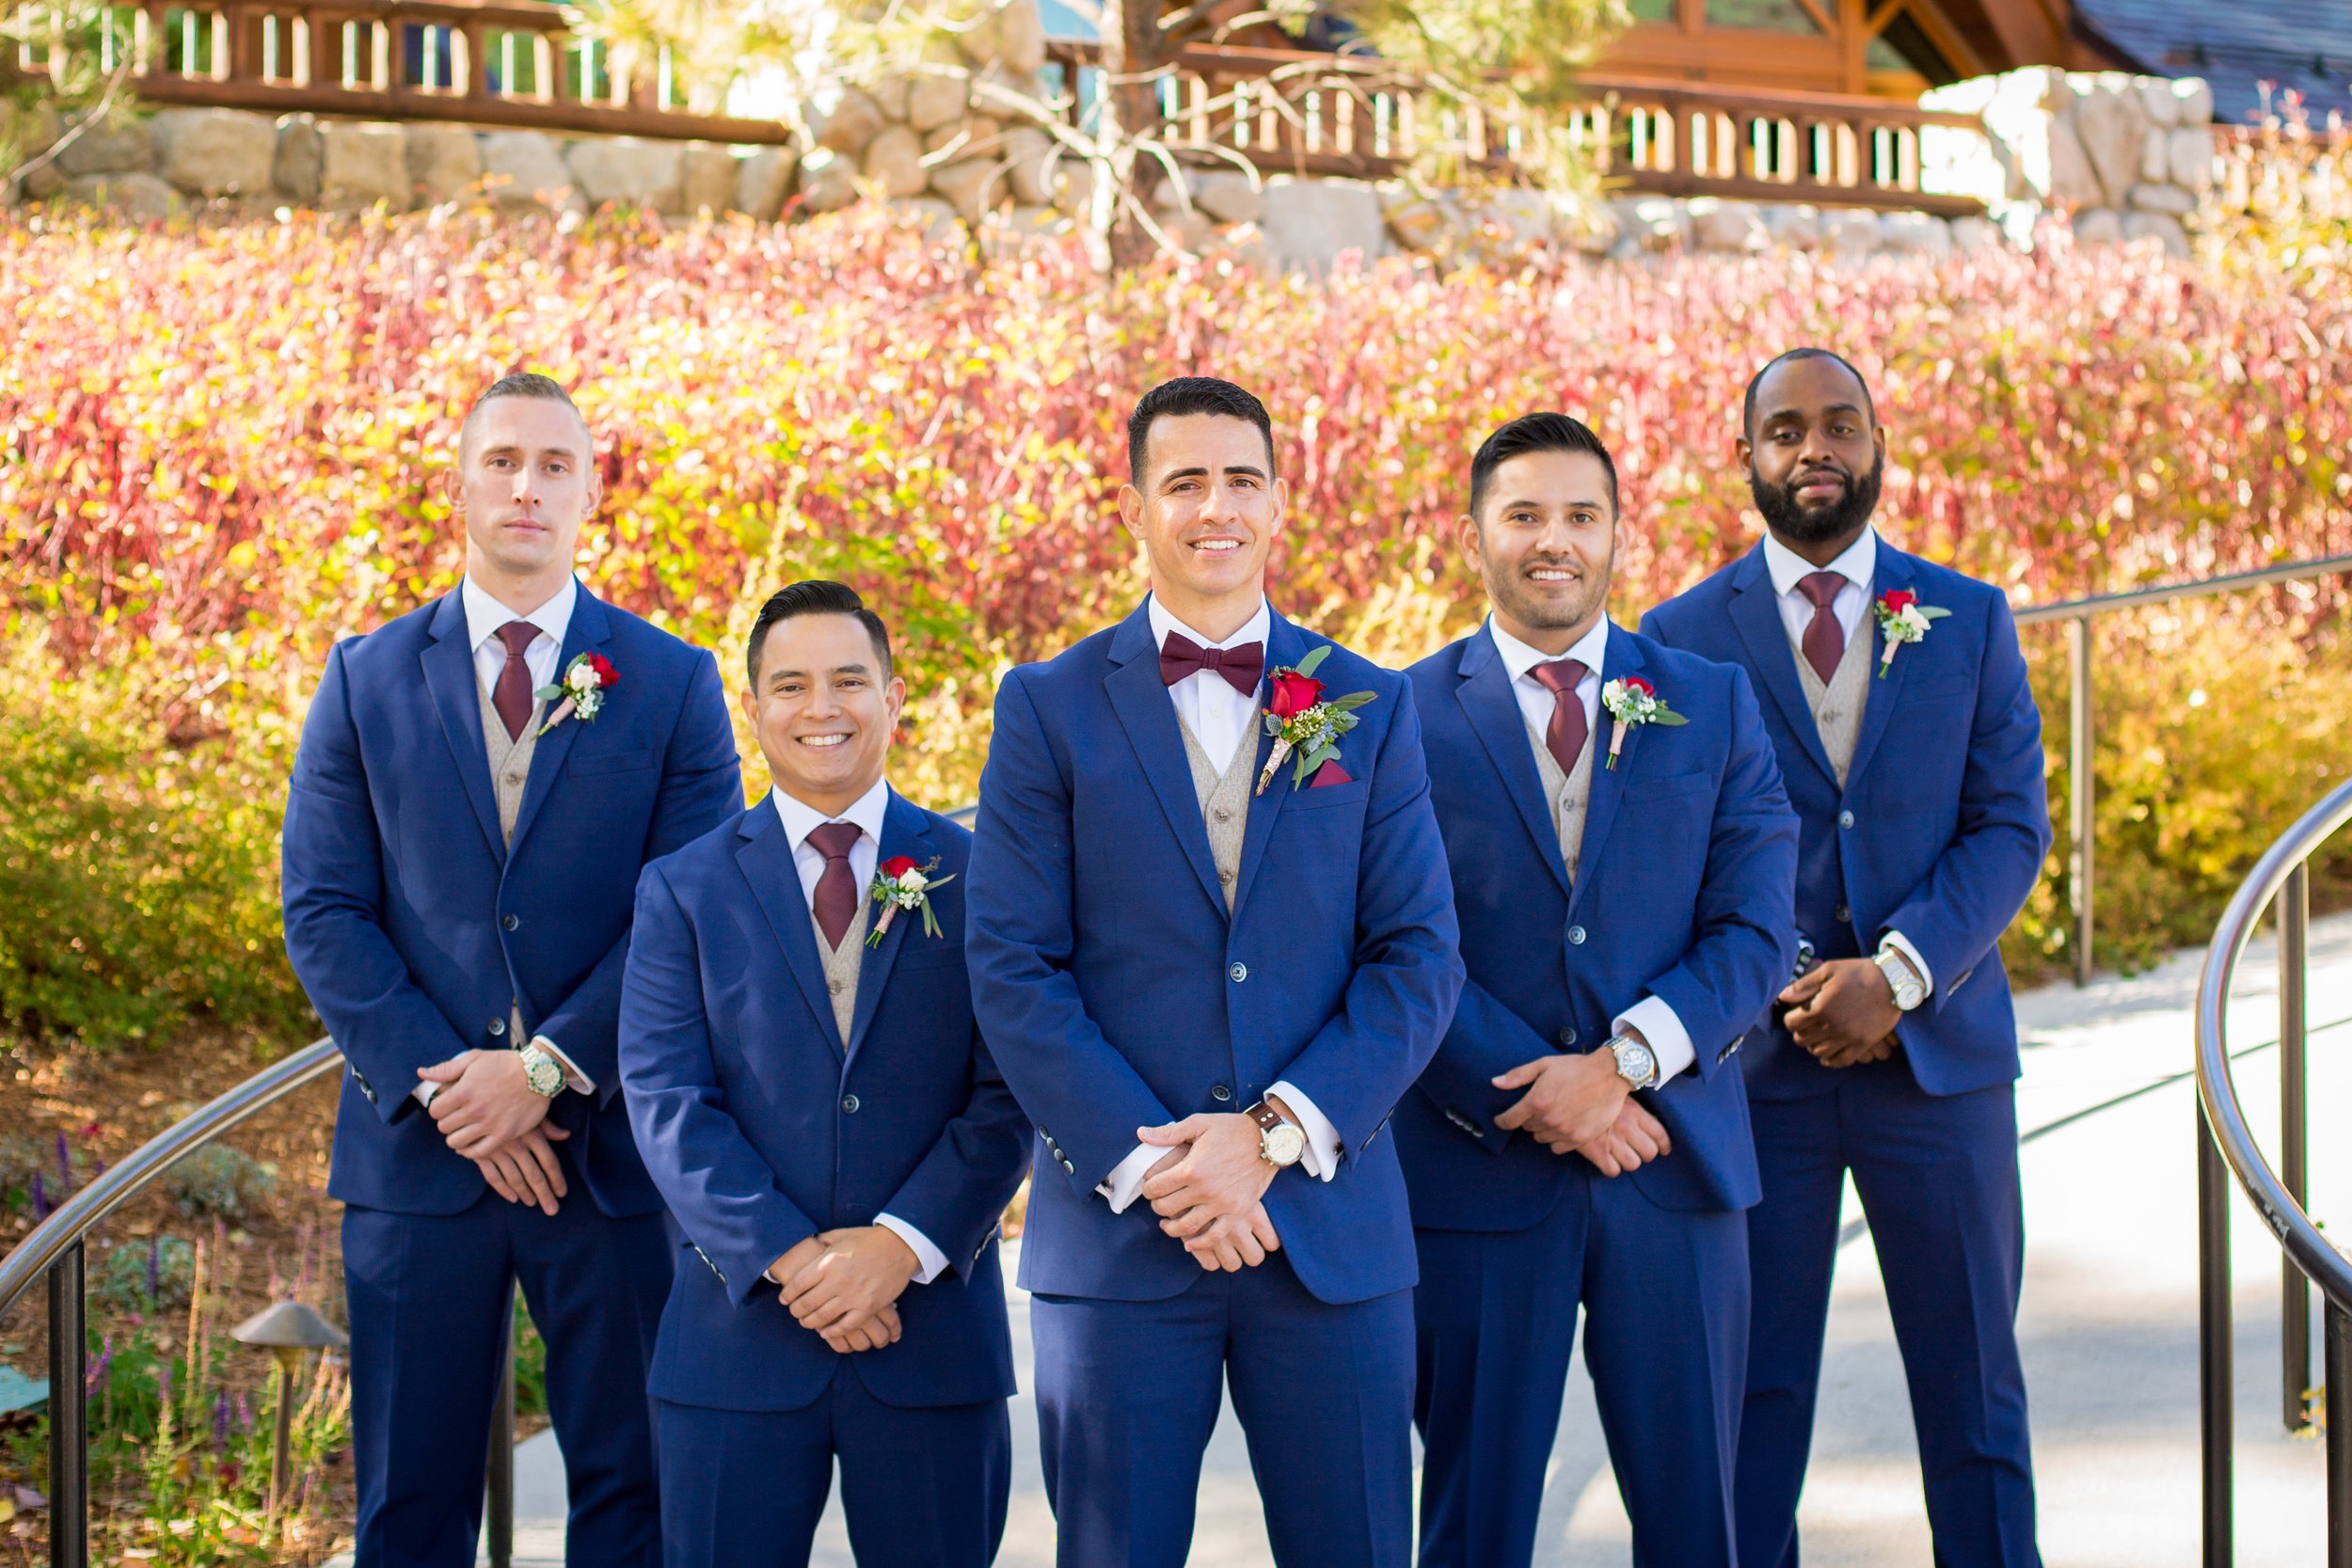 1 Britni & Dennis - Edgewood Tahoe - Sacramento Wedding Photographer - Ashley Teasley Photography-97.JPG